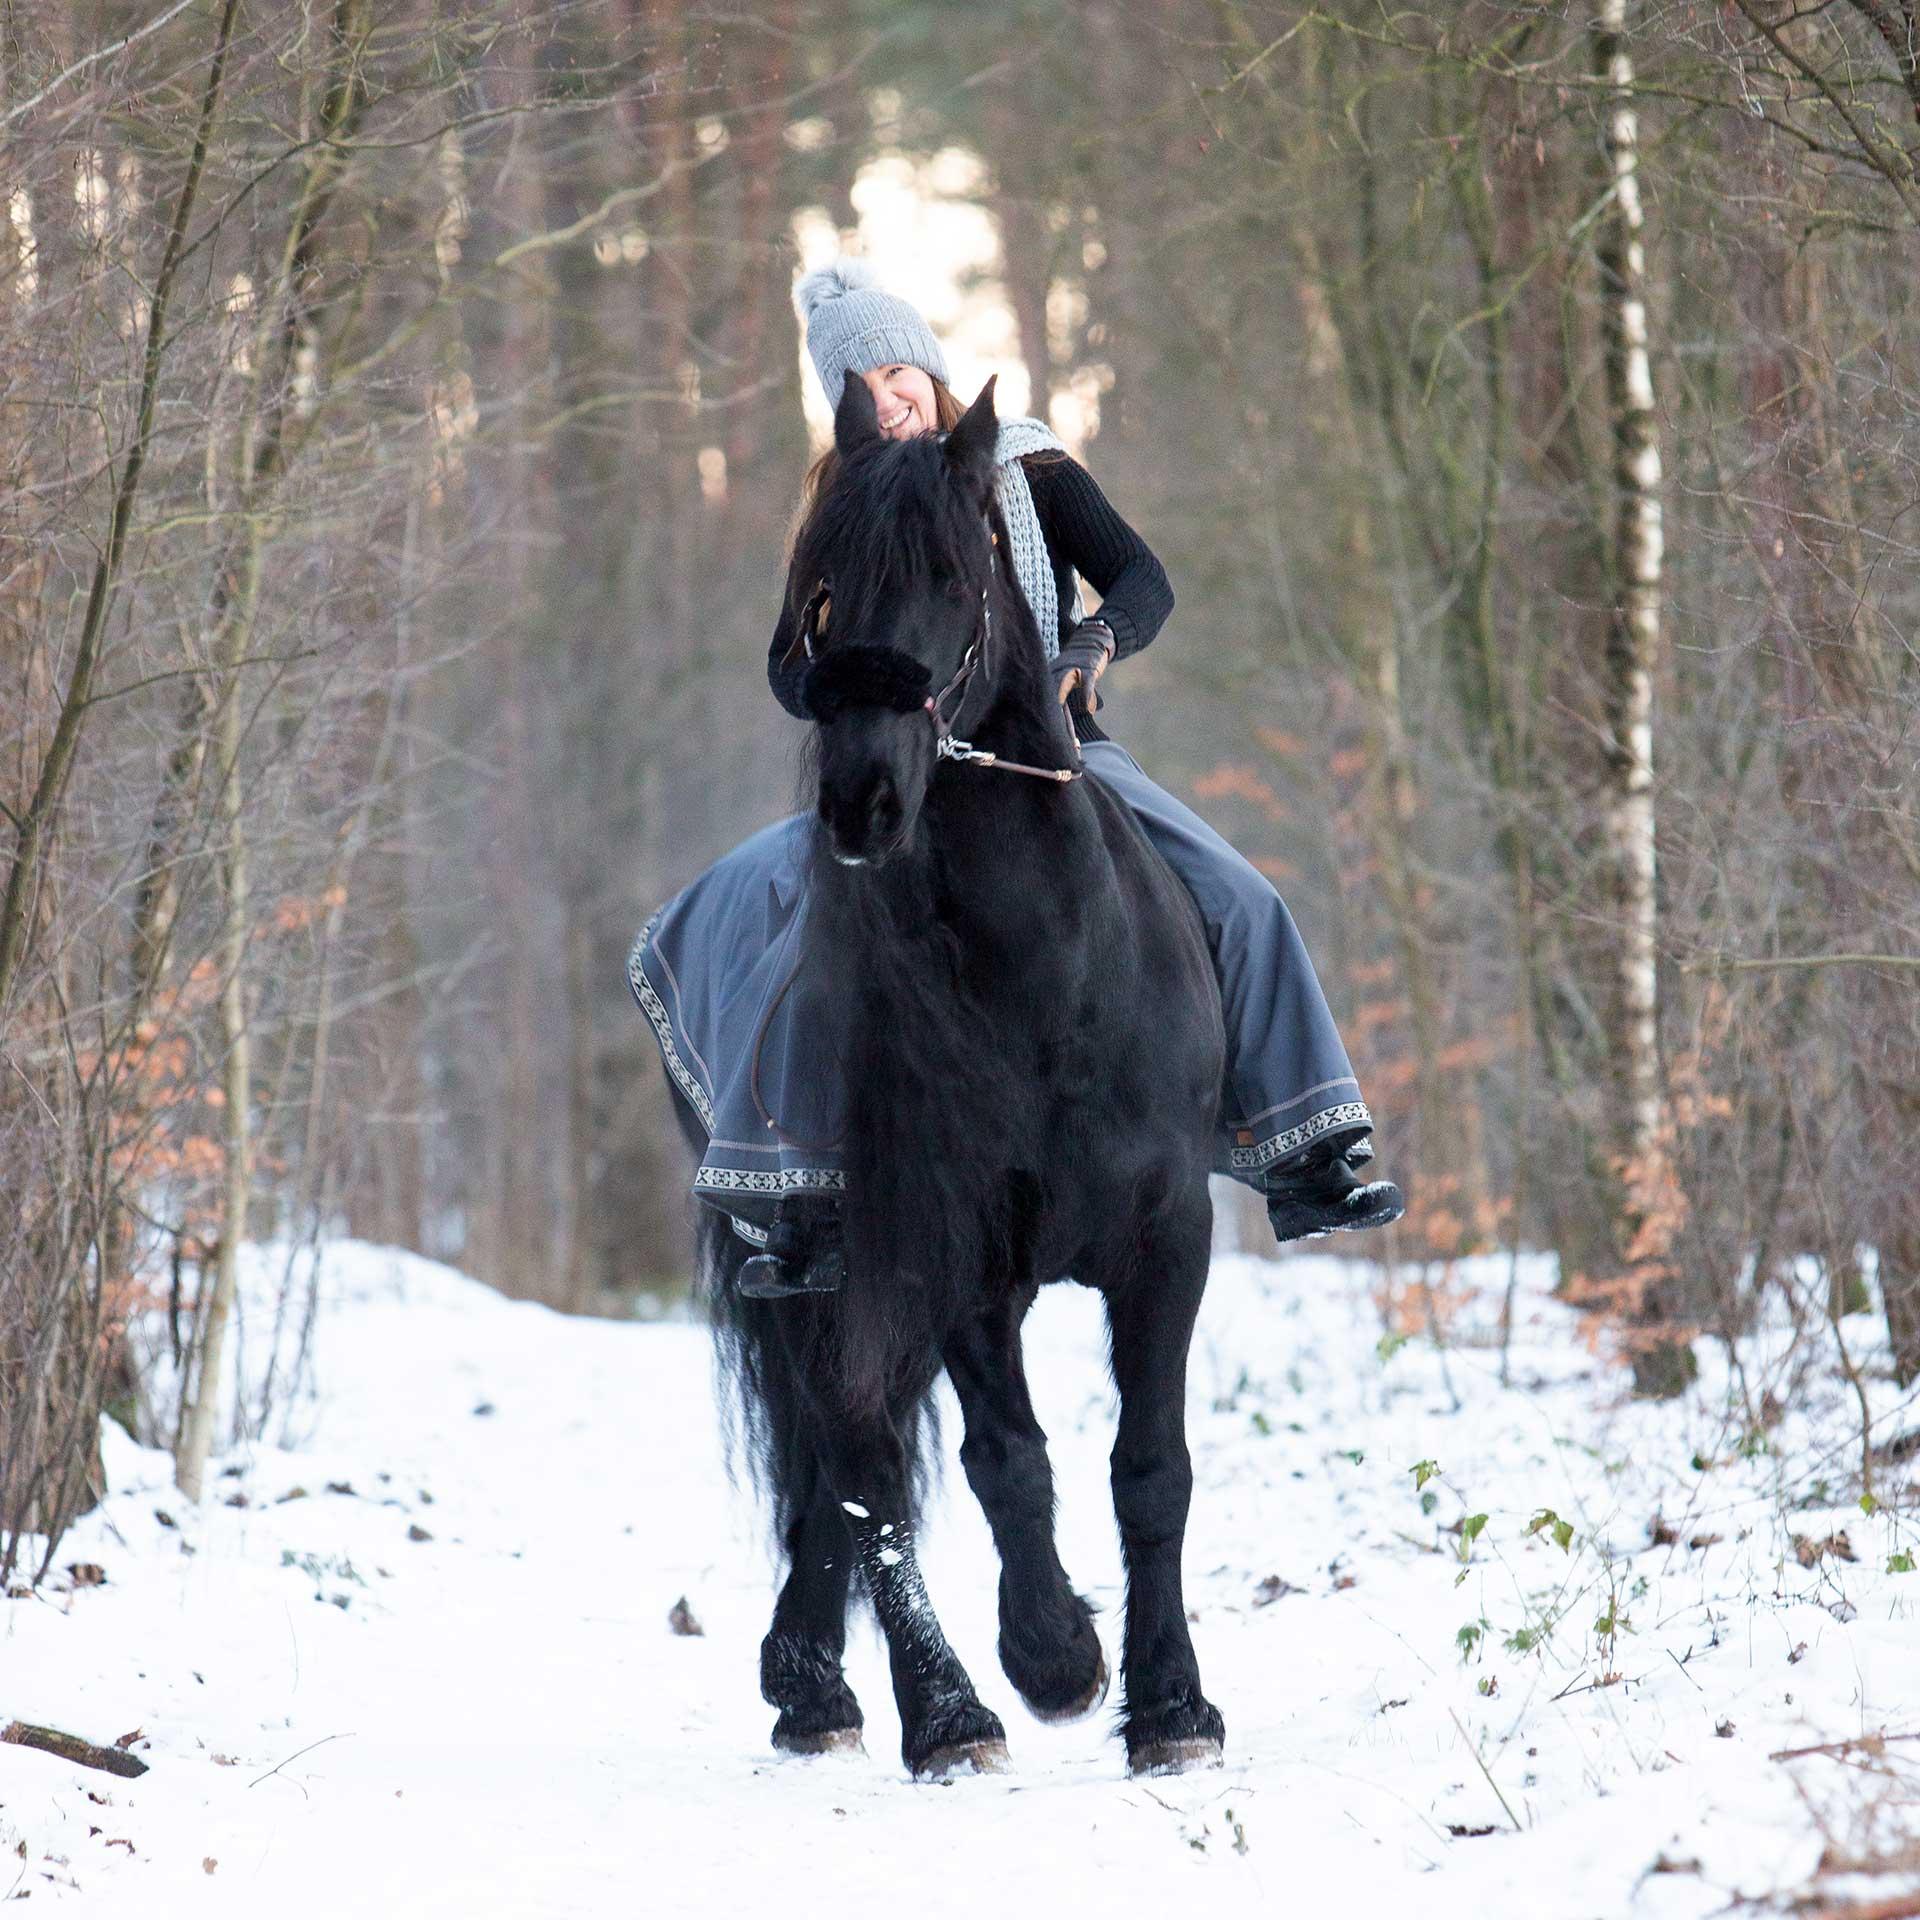 angela pfeiffer Fotografin, angela pfeiffer, pferdefotografin hamburg, pferdeshooting, pferdefotografie, pferdeshooting hamburg, pferdefoto, professionelle Pferdefotos, professionelles pferdeshooting, individuelle pferdefotos, pferdeportraits, fotos turnierpferde, turnierfotos, sportpferde fotos, fotografie, sportpferdefotografie, portrait mit Pferd, Shooting mit Pferd, pferdefotografin Norddeutschland, individuelles pferdeshooting, authentisches pferdeshooting, individuelle Pferdefotografie, klassische Pferdefotografie, klassische Pferdeportraits, friese, pferd in bewegung